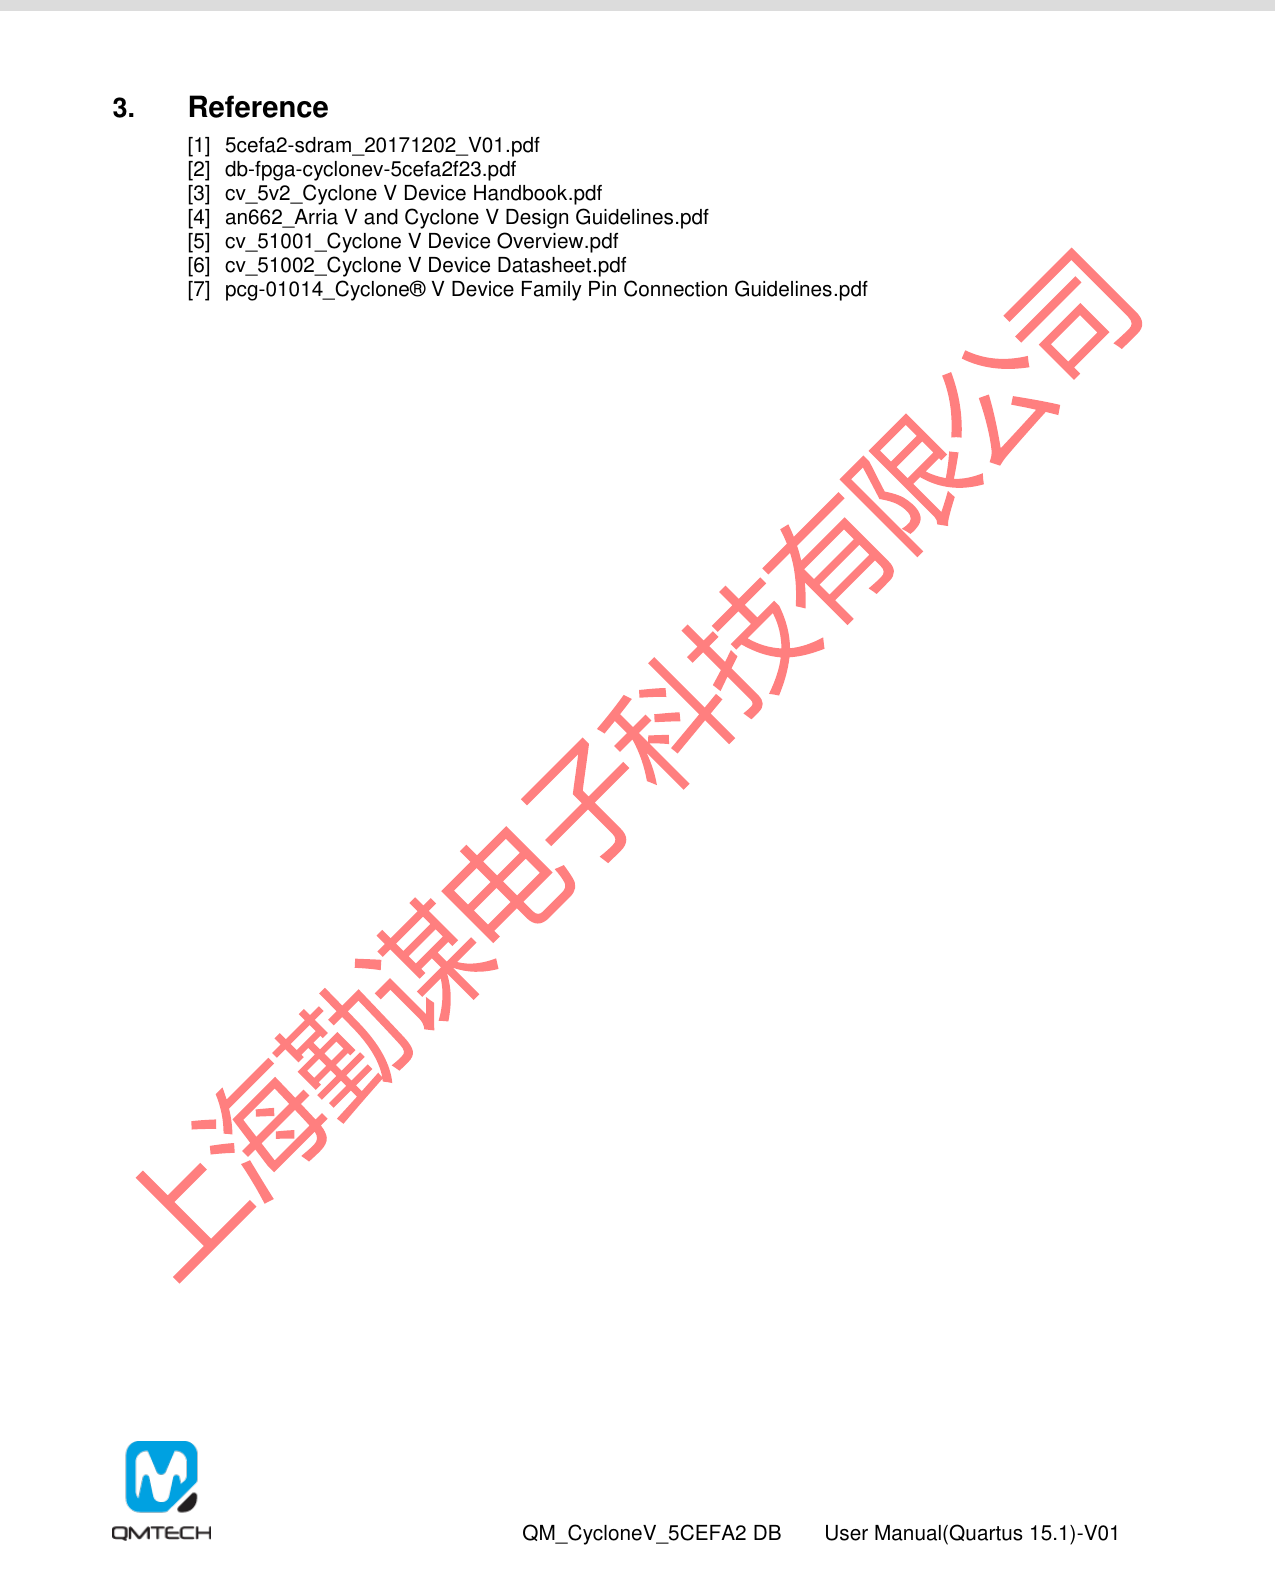 QM_CycloneV_5CEFA2F23开发板 用户手册(Quartus15 1使用) V01 QMTECH